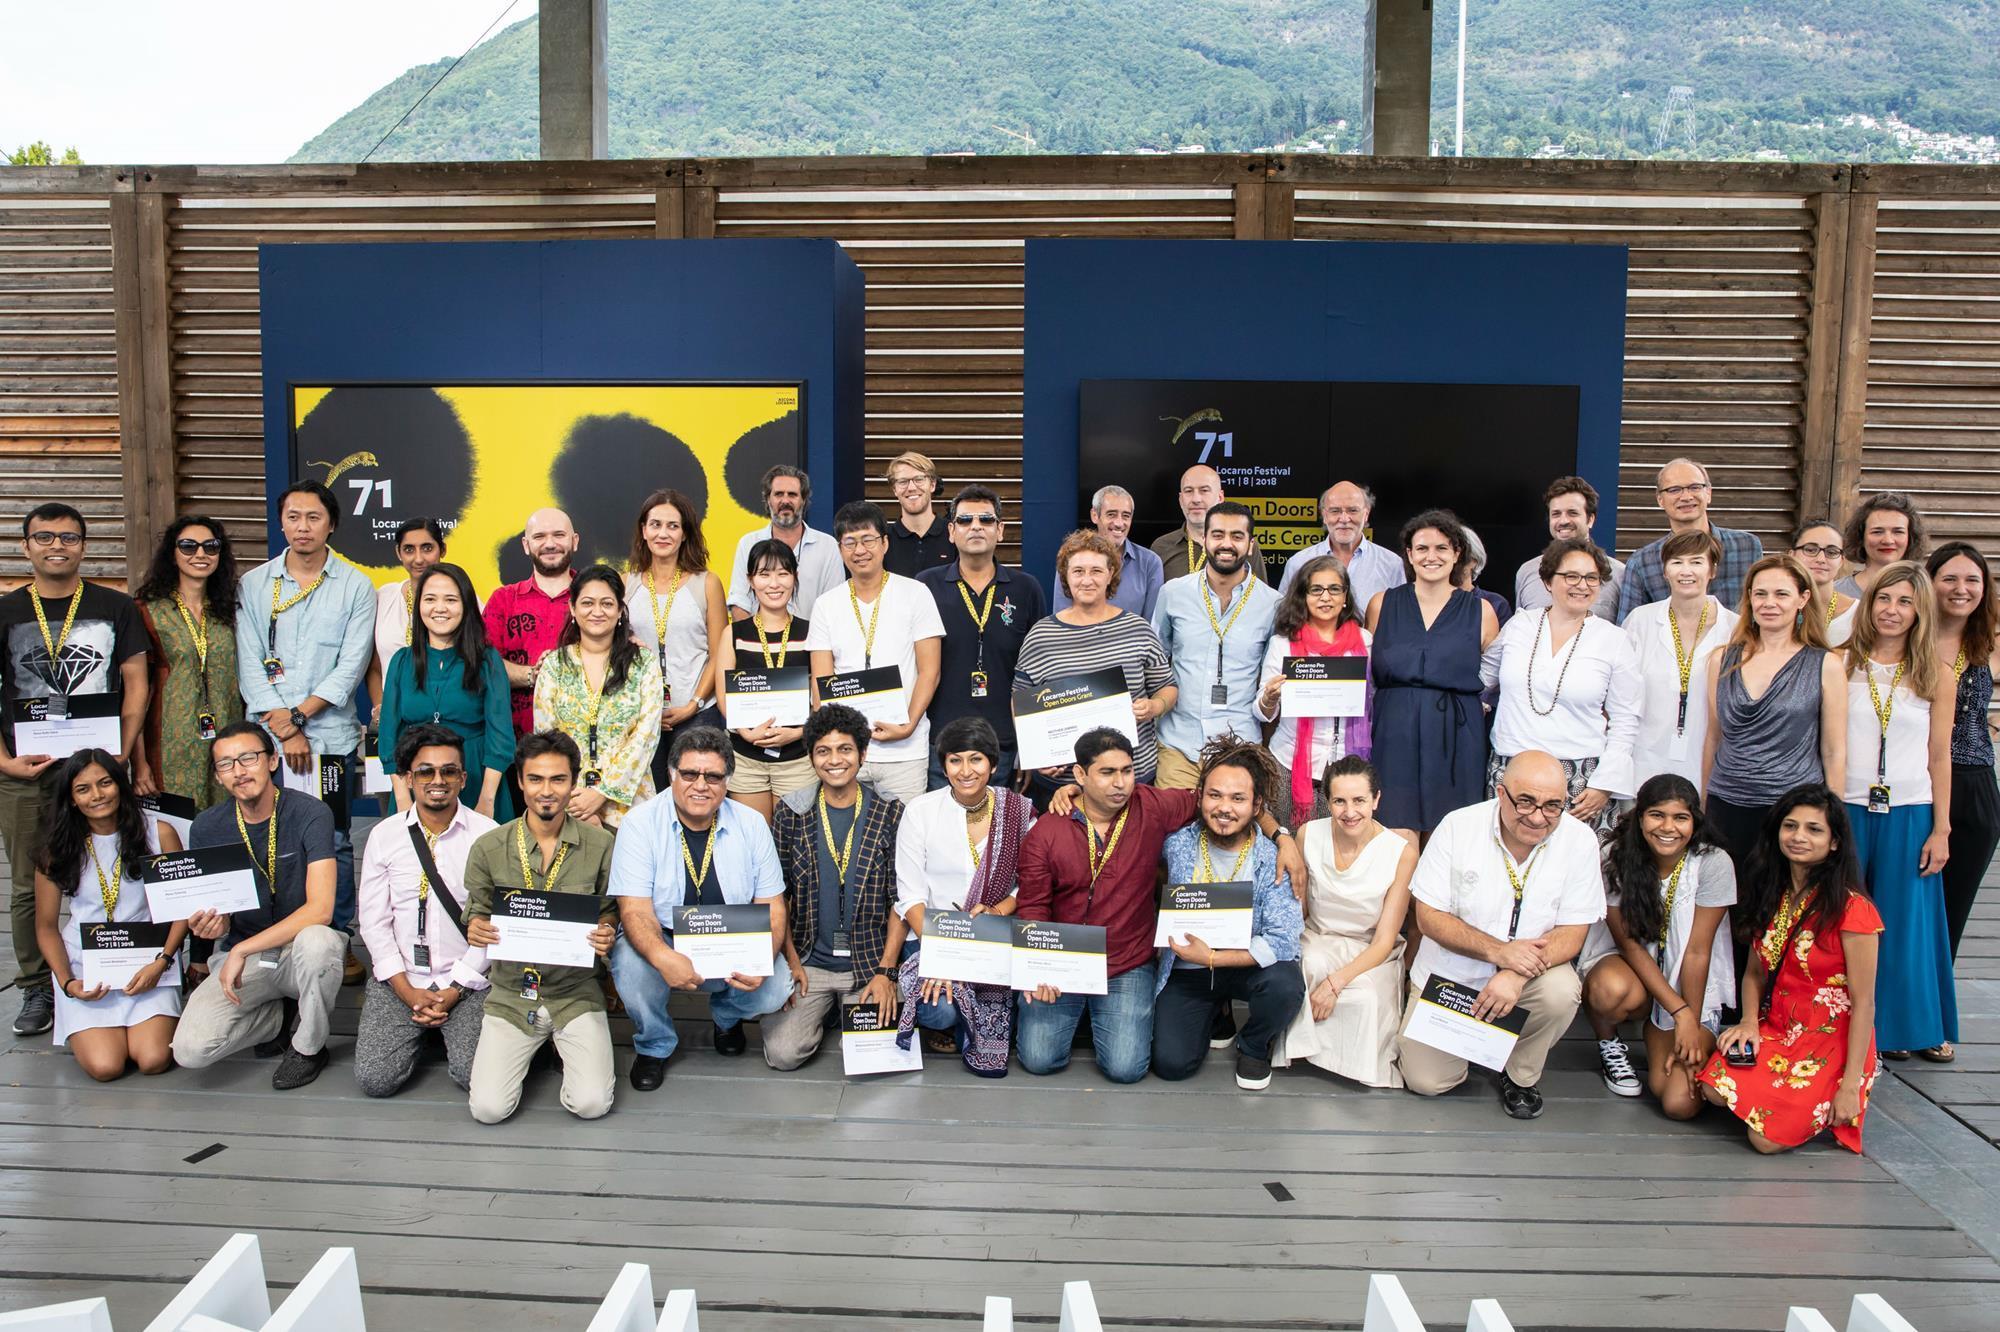 Locarno 2018 reveals winners of Open Doors prizes   News